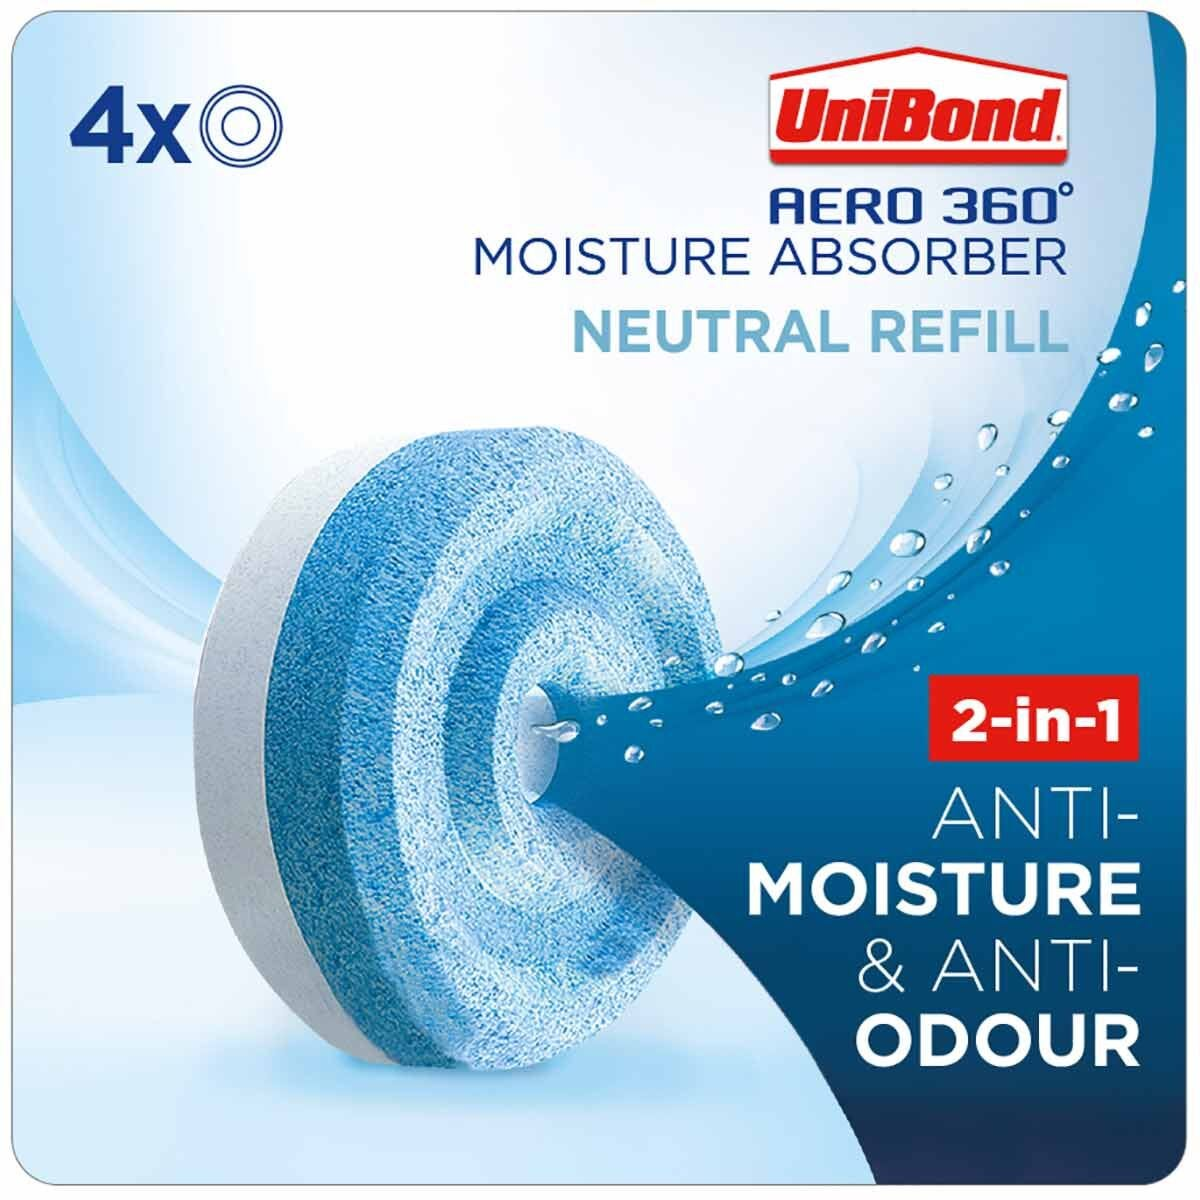 Unibond Aero 360 Moisture Absorber Neutral Refills Pack of 4